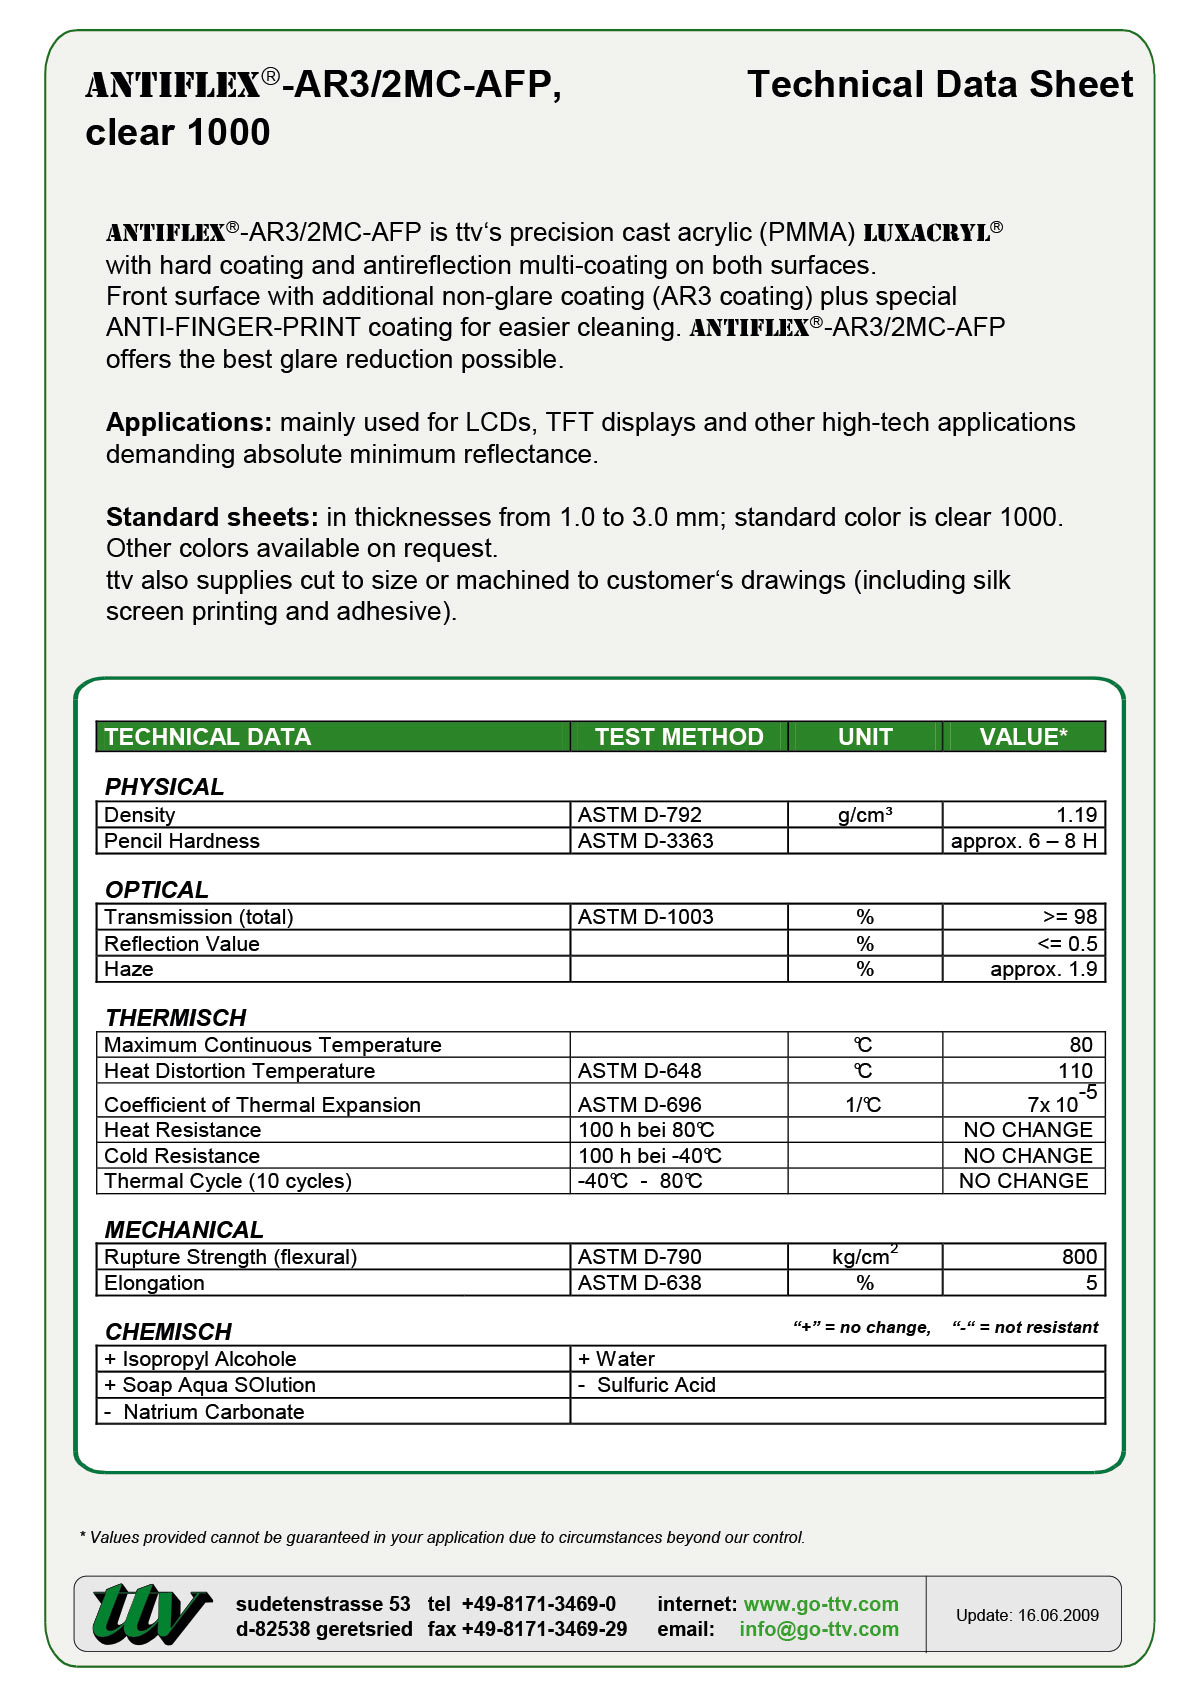 ANTIFLEX-AR3/2MC-AFP Data sheet